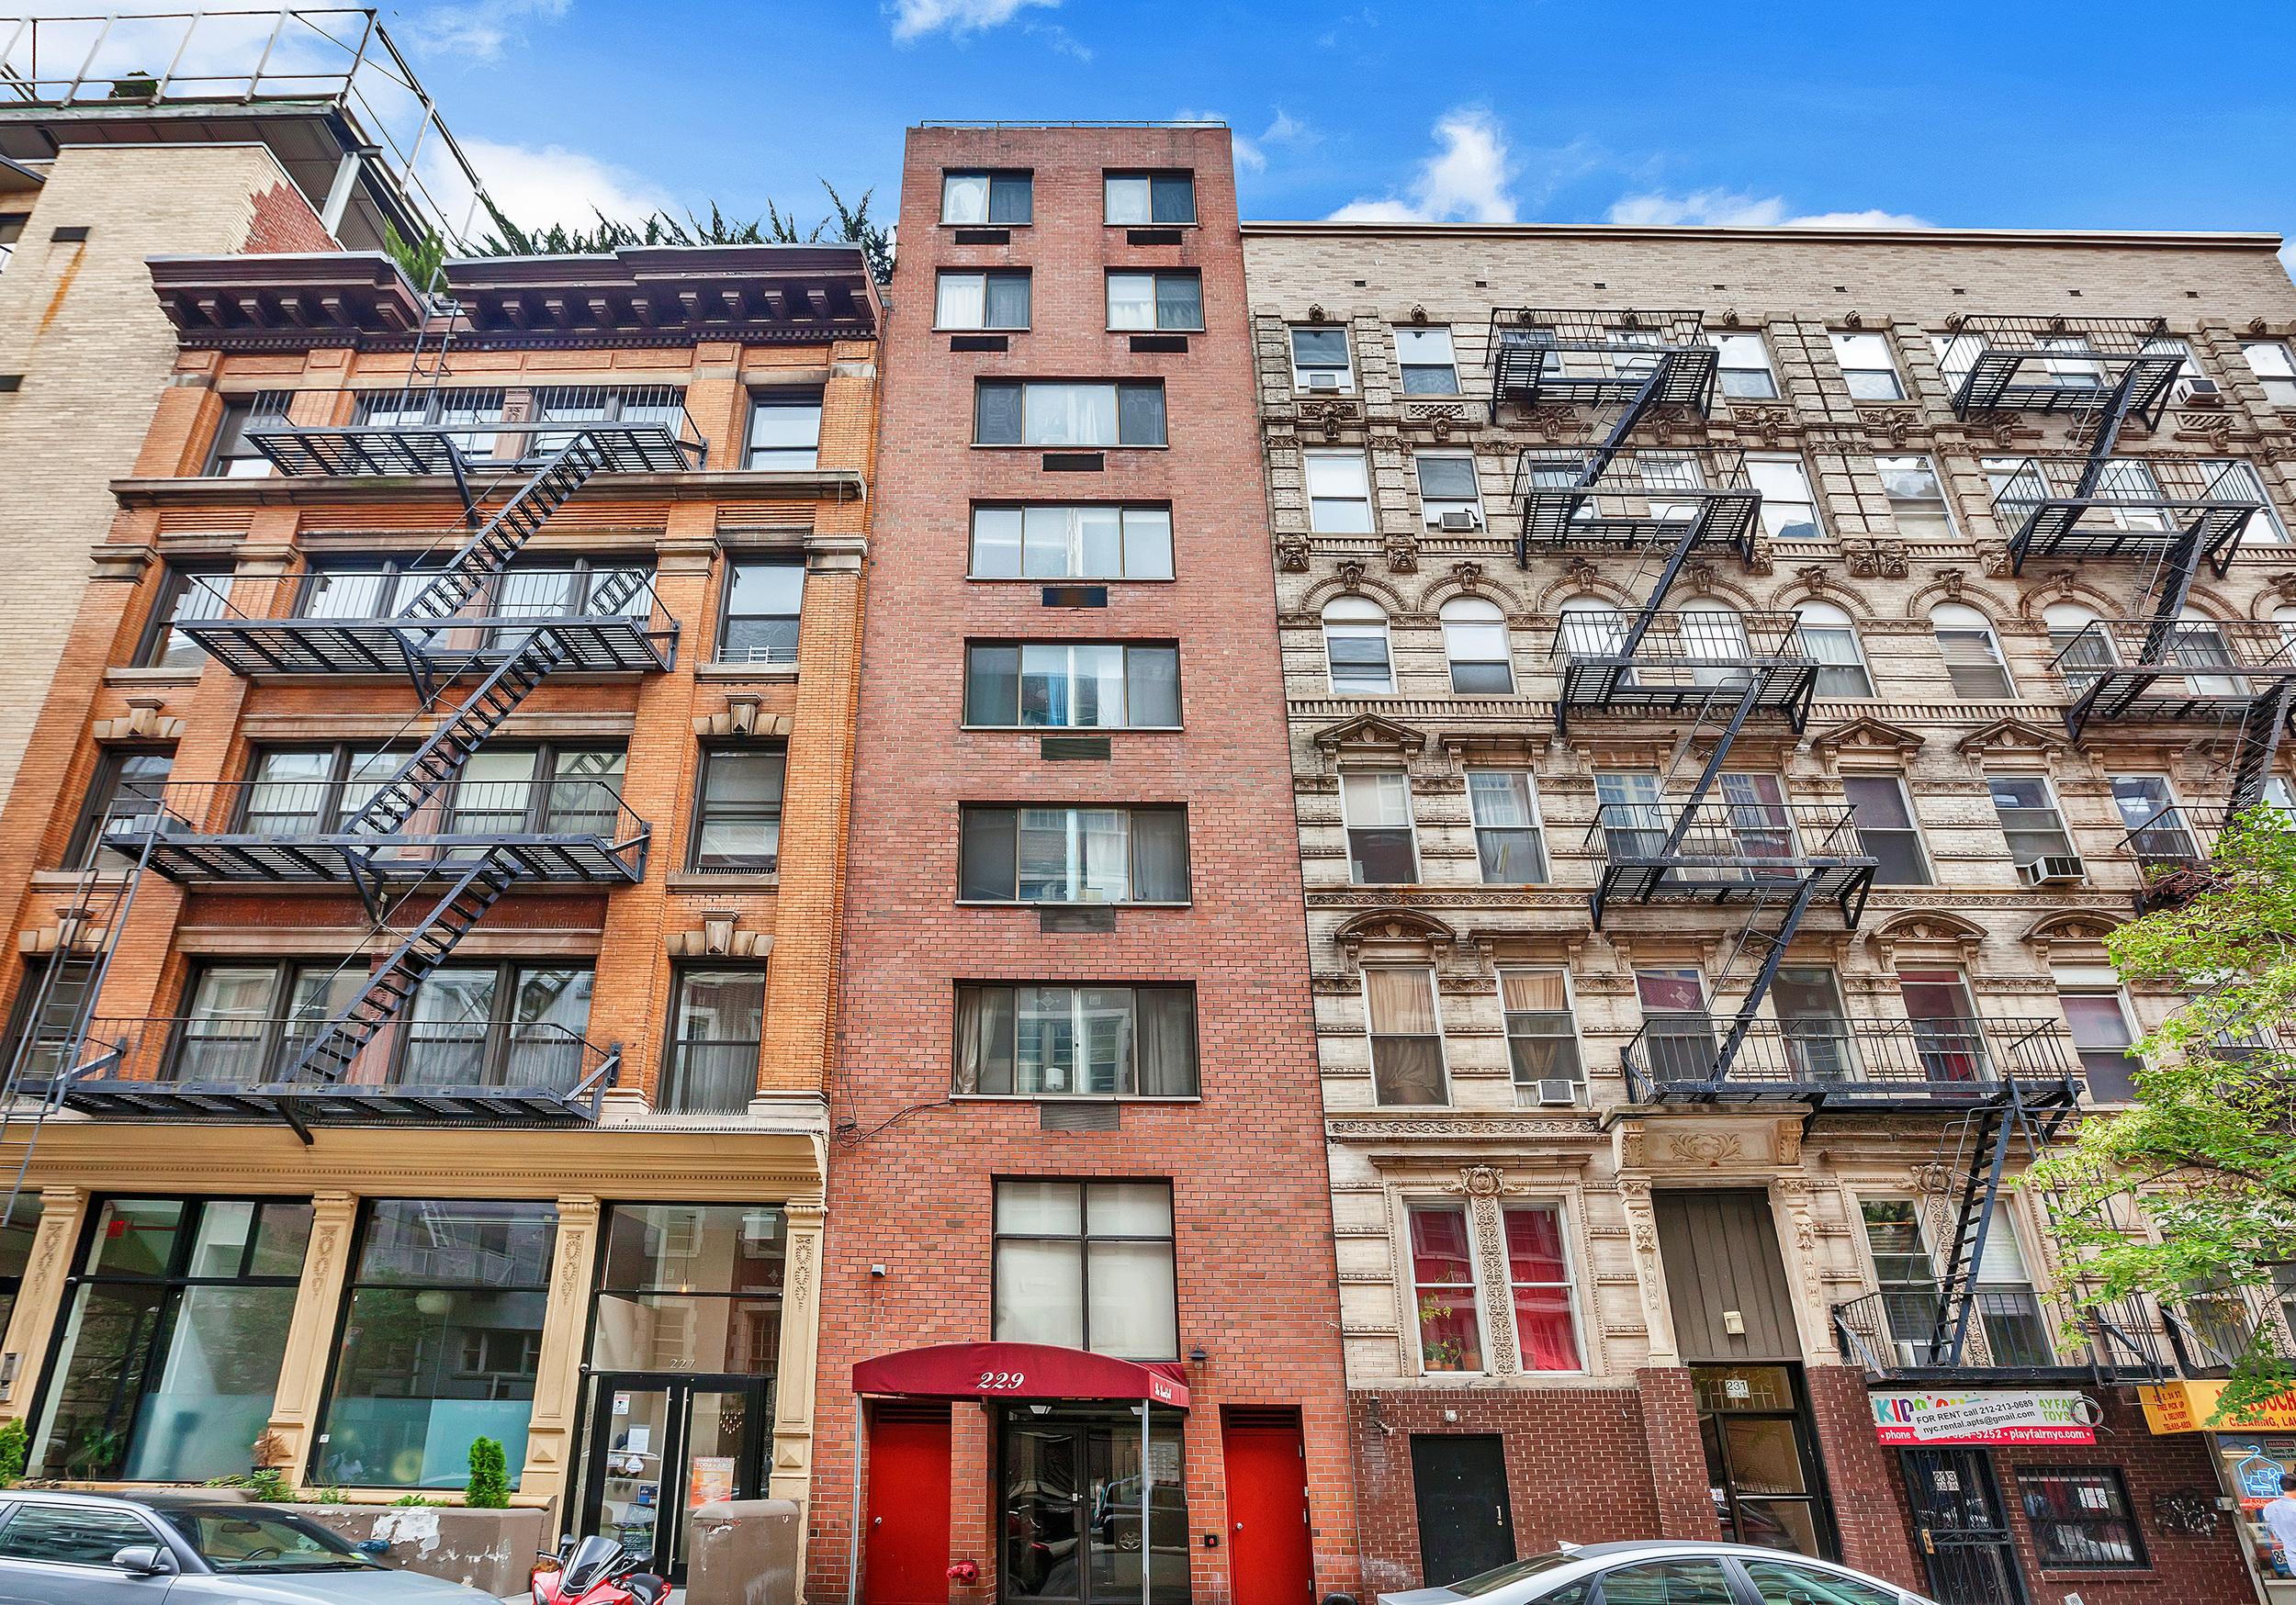 229 East 24th Street - $9,995,000